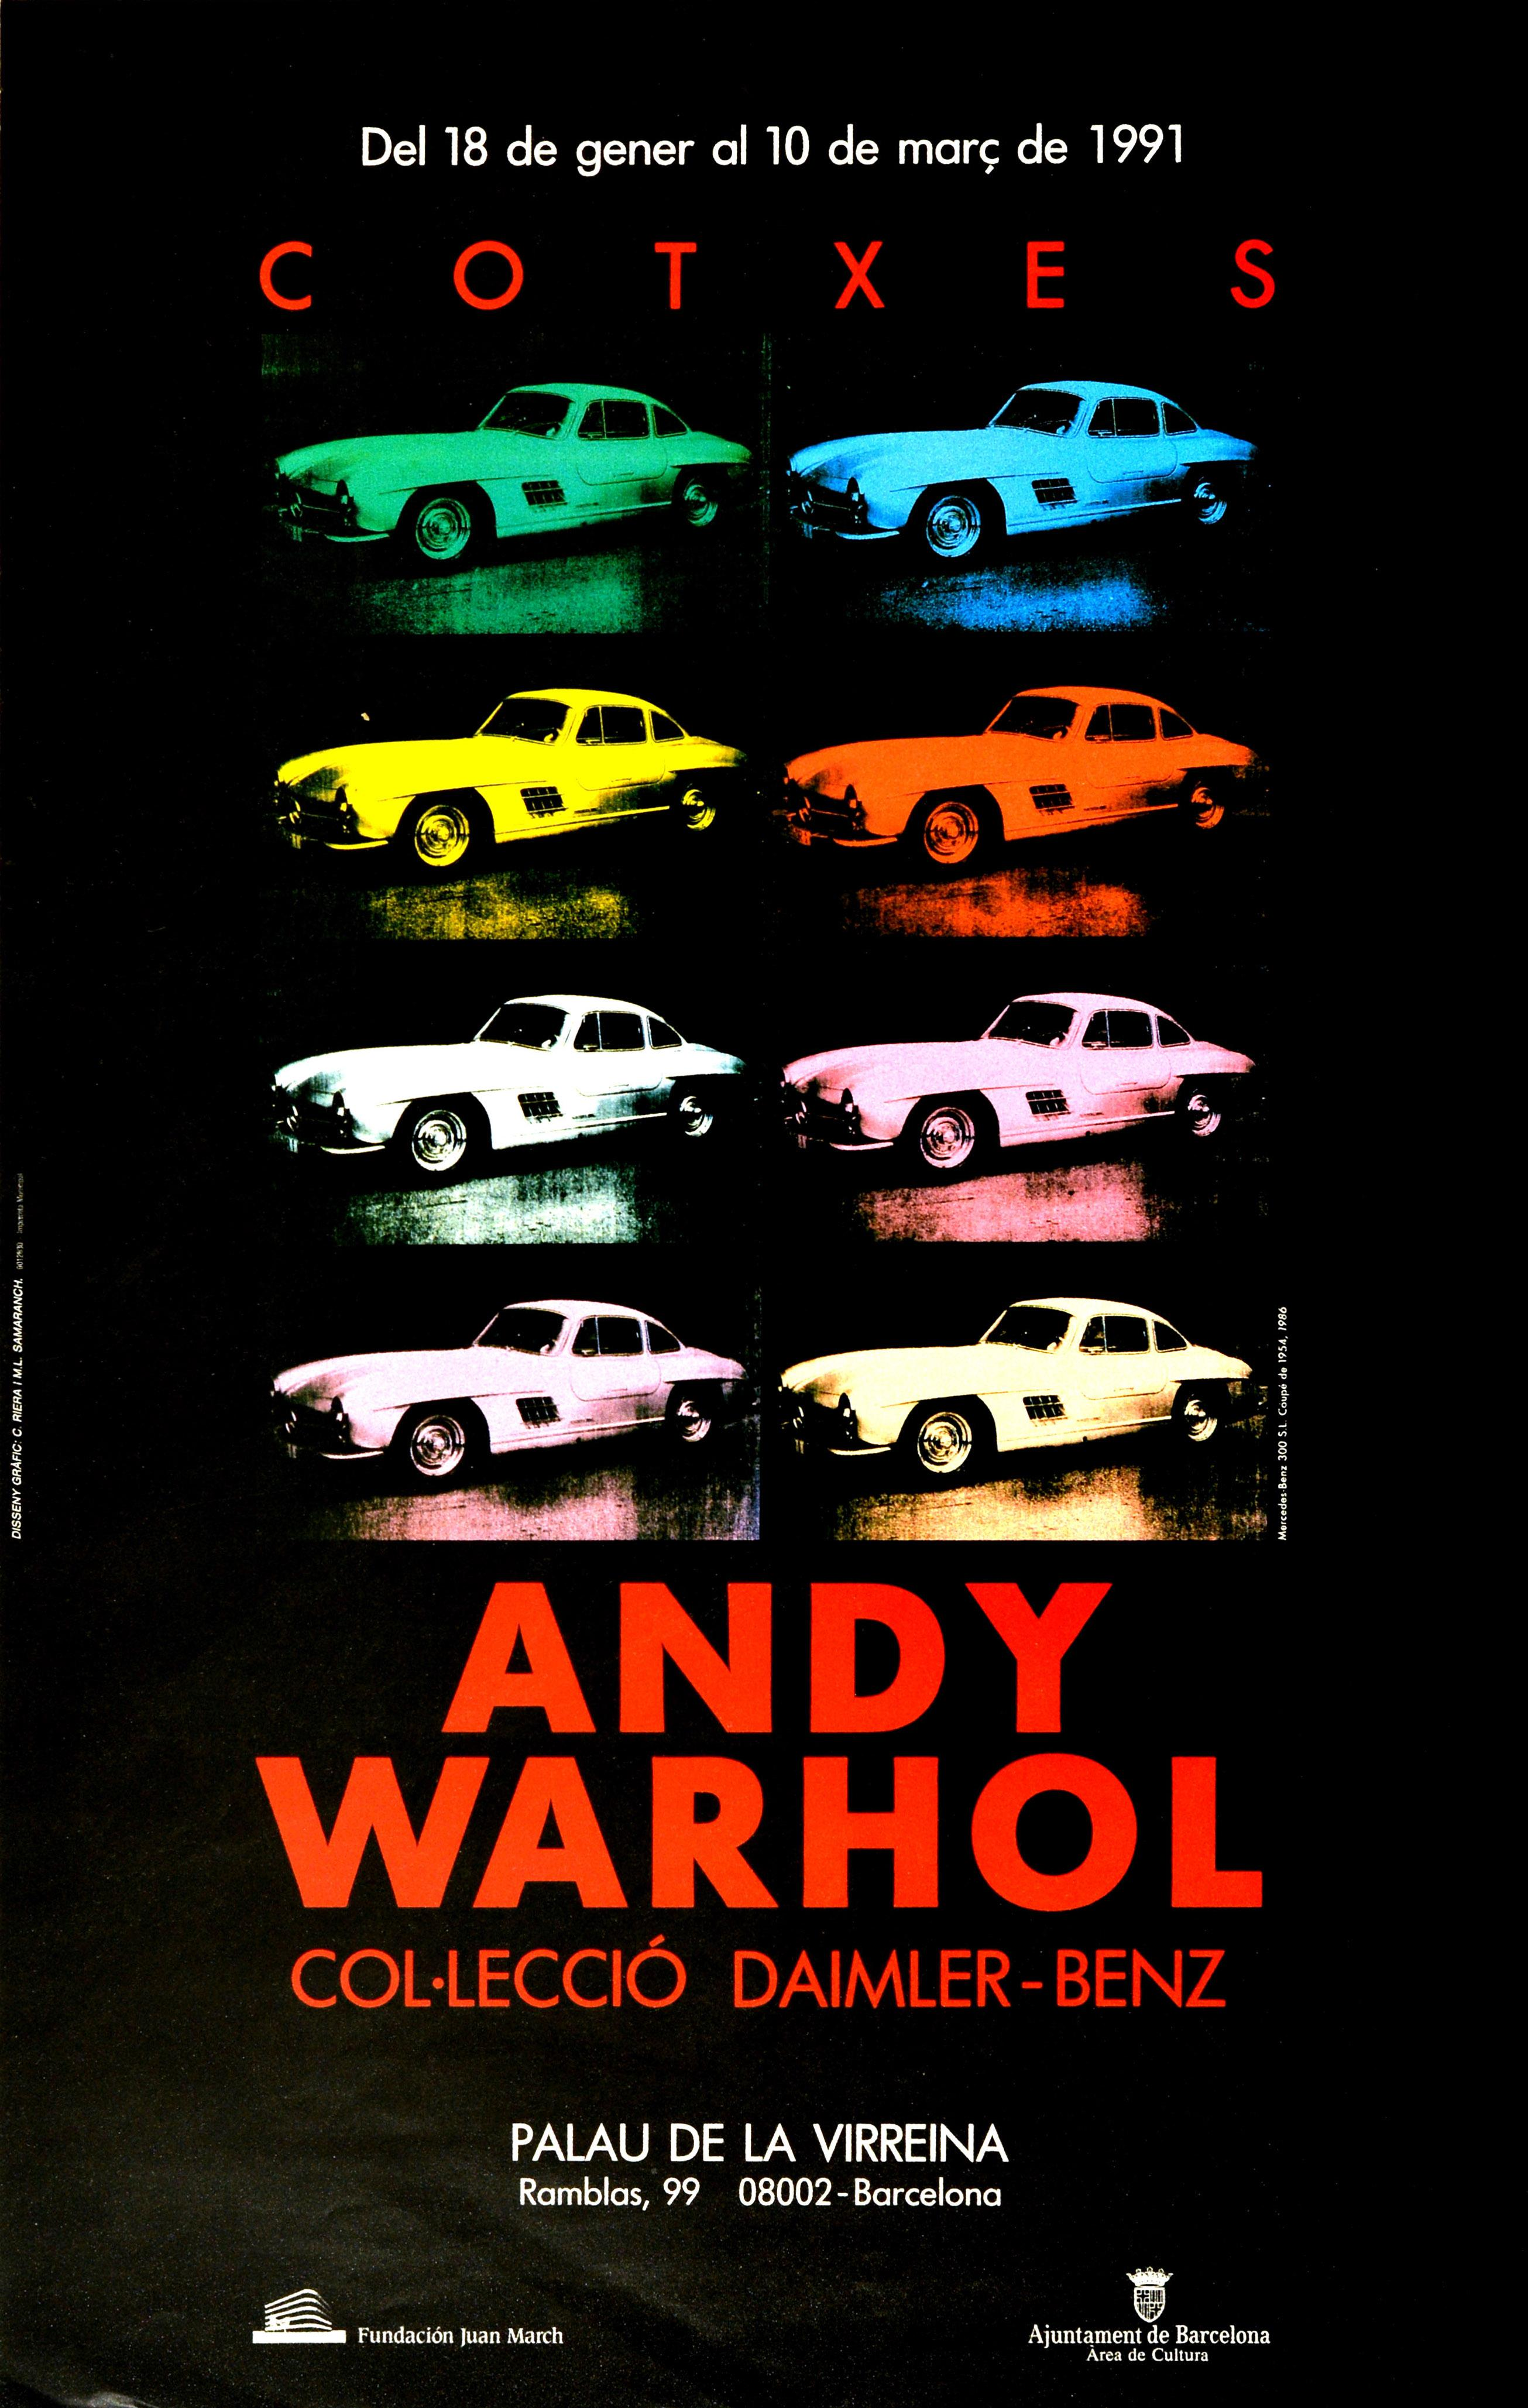 Original Vintage Poster Andy Warhol Cars Exhibition Daimler Benz Pop Art Design